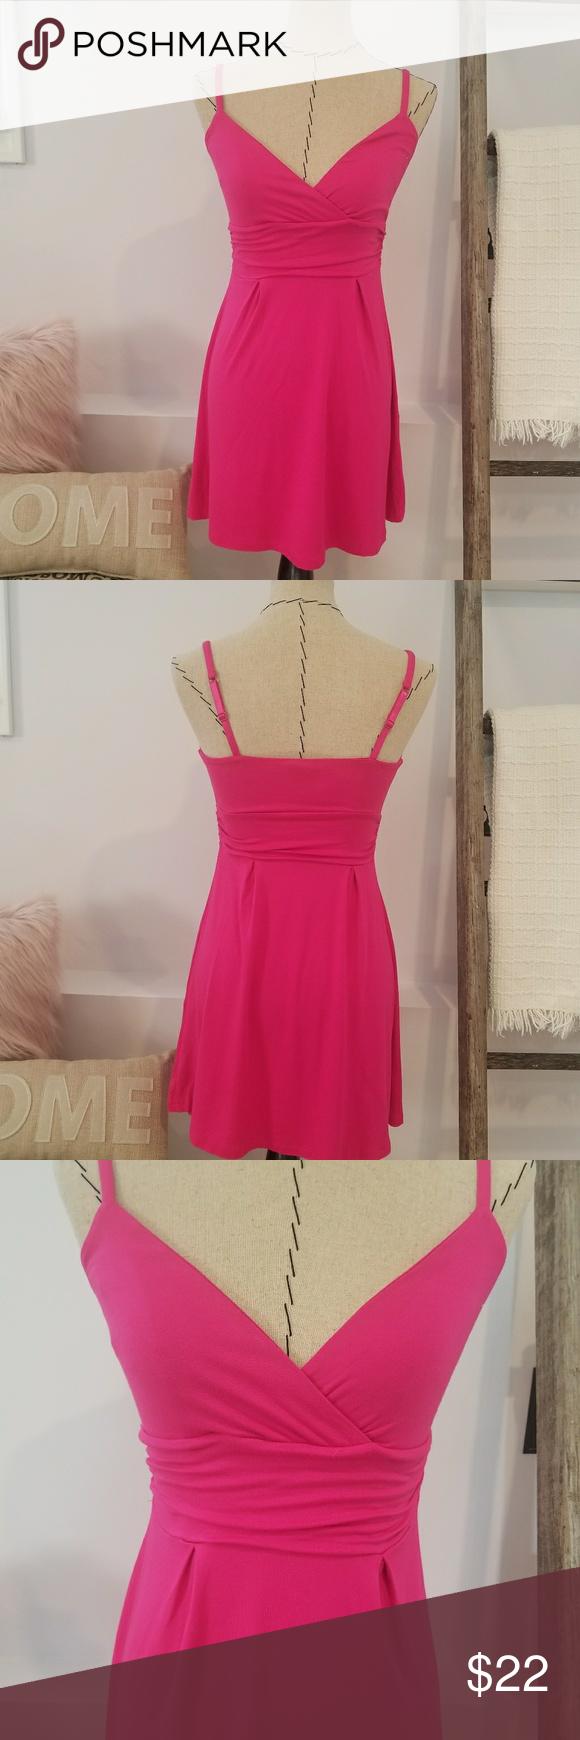 Pink dress with jean jacket  Express Pink Dress NWT  Pinterest  Stylish dresses Express